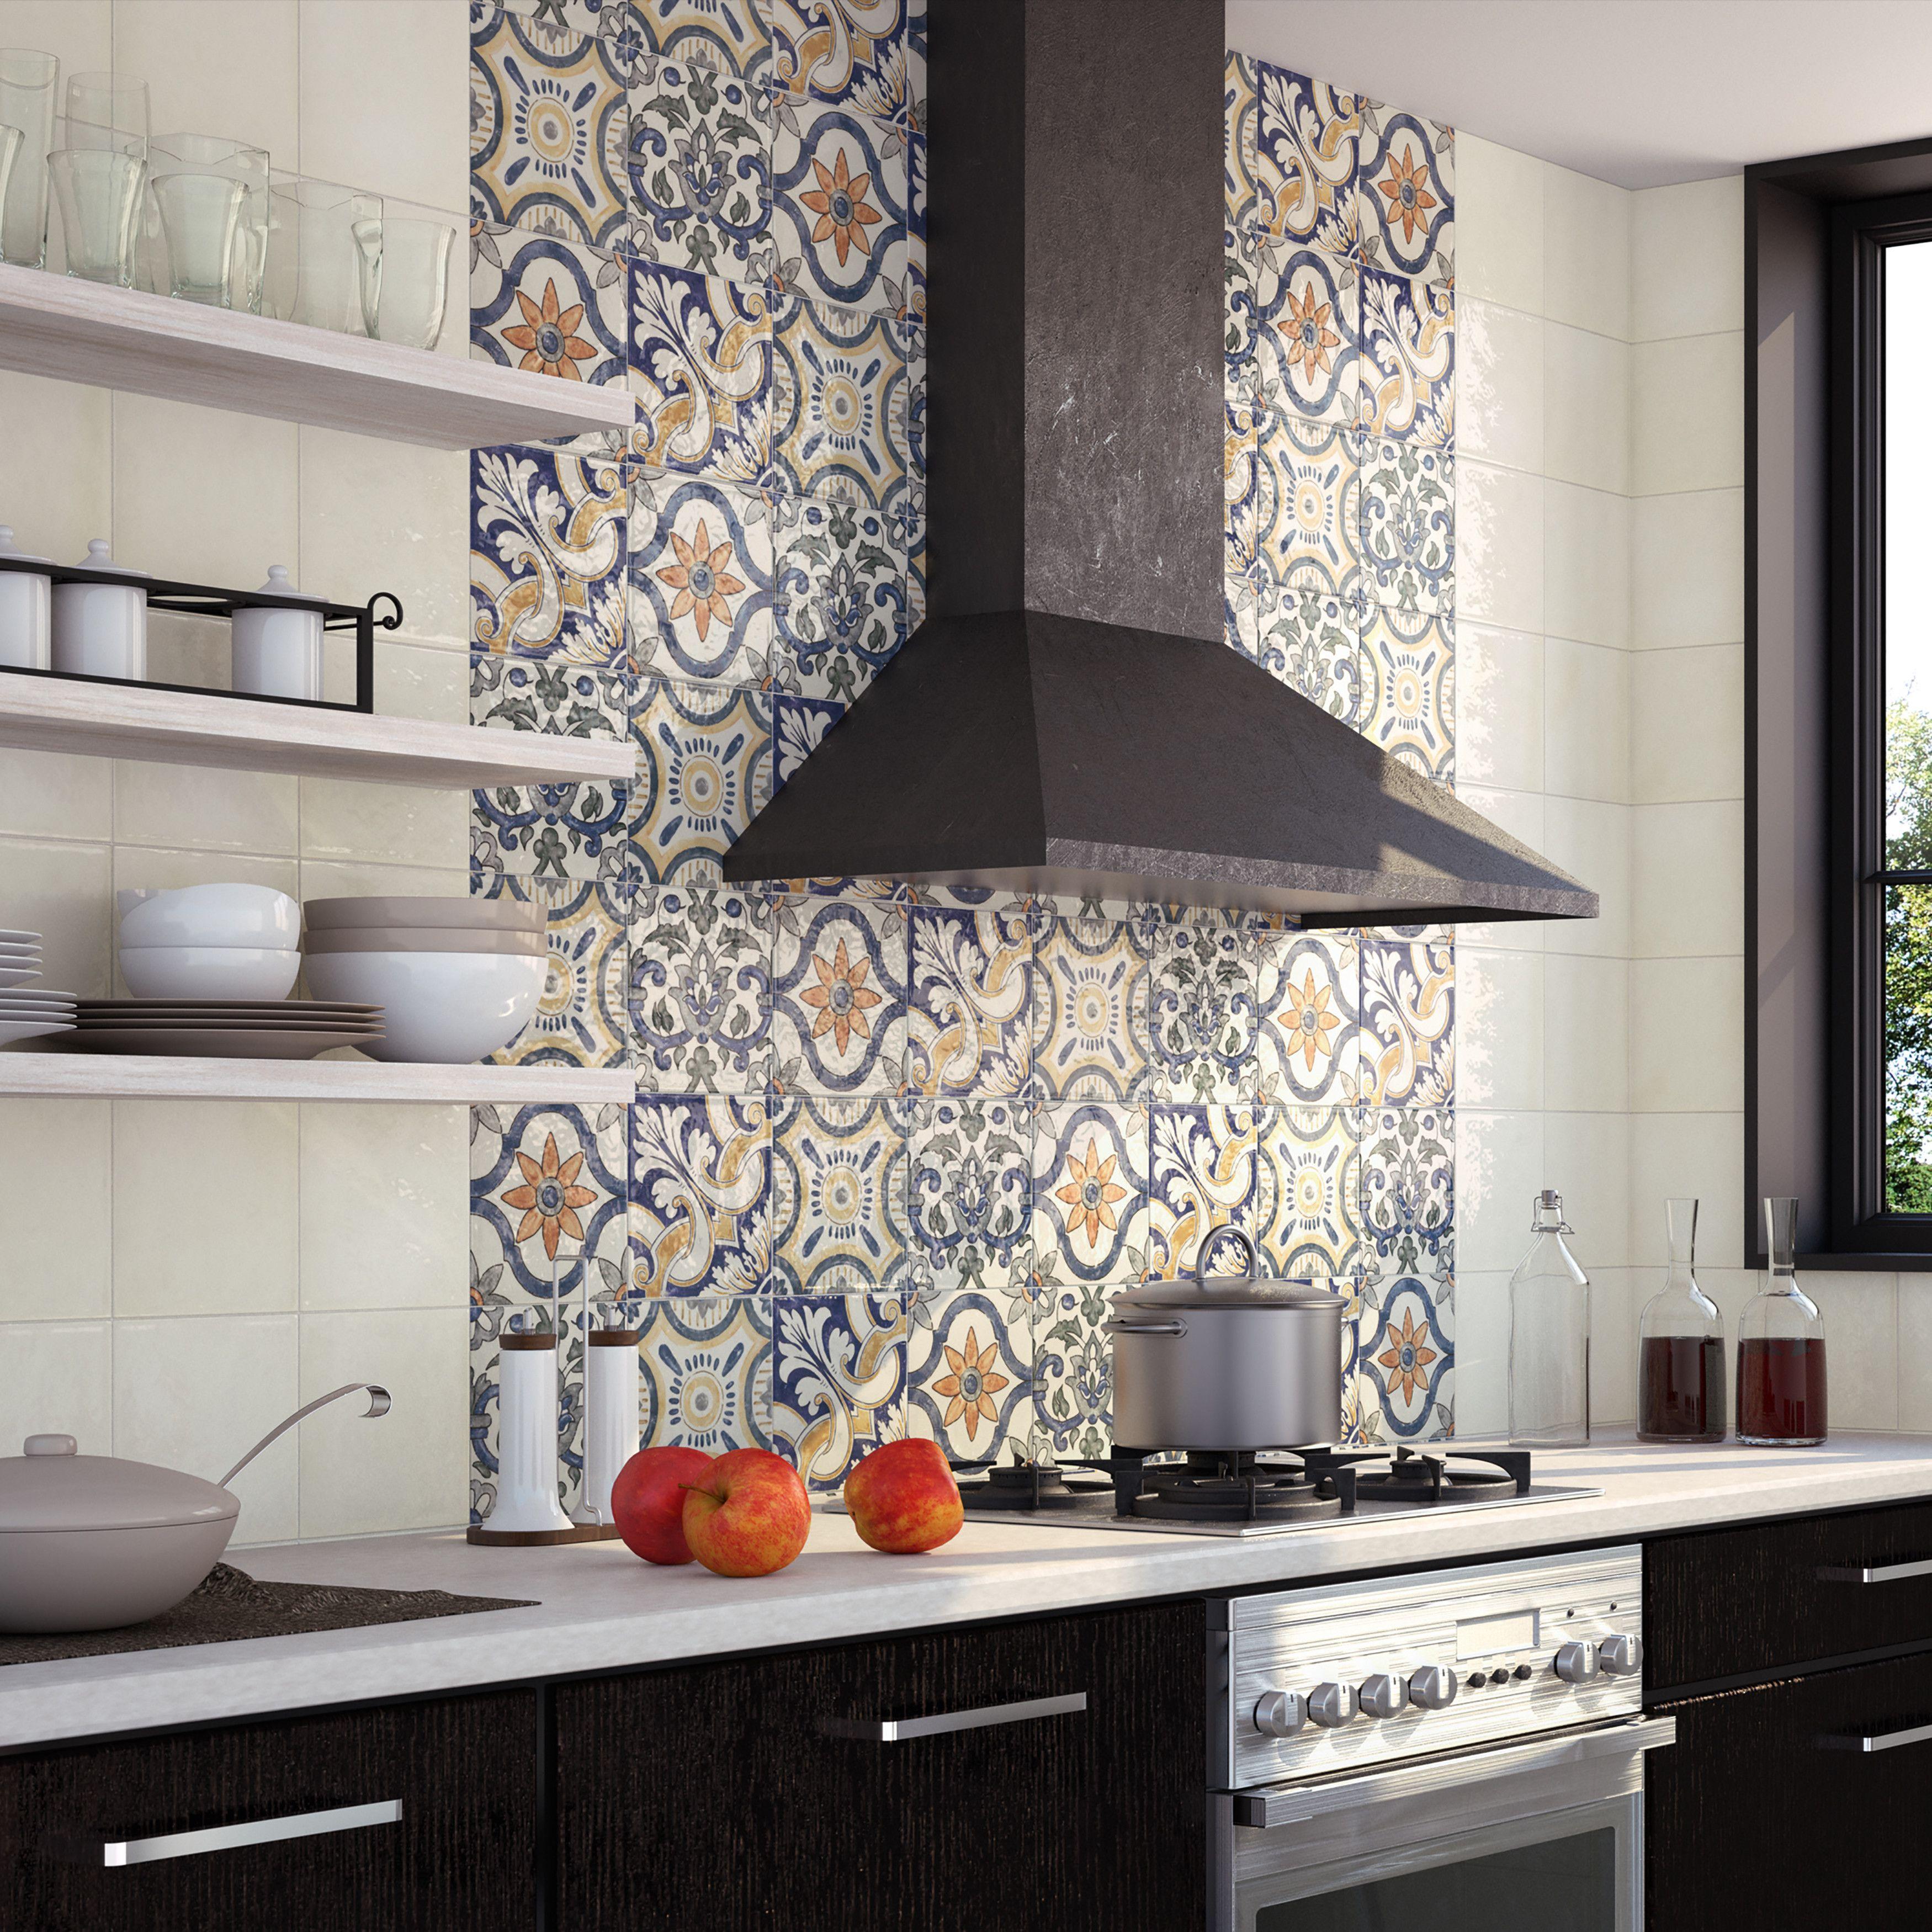 Avaricon 8 X 8 Ceramic Field Tile Ceramic Wall Tiles Wall